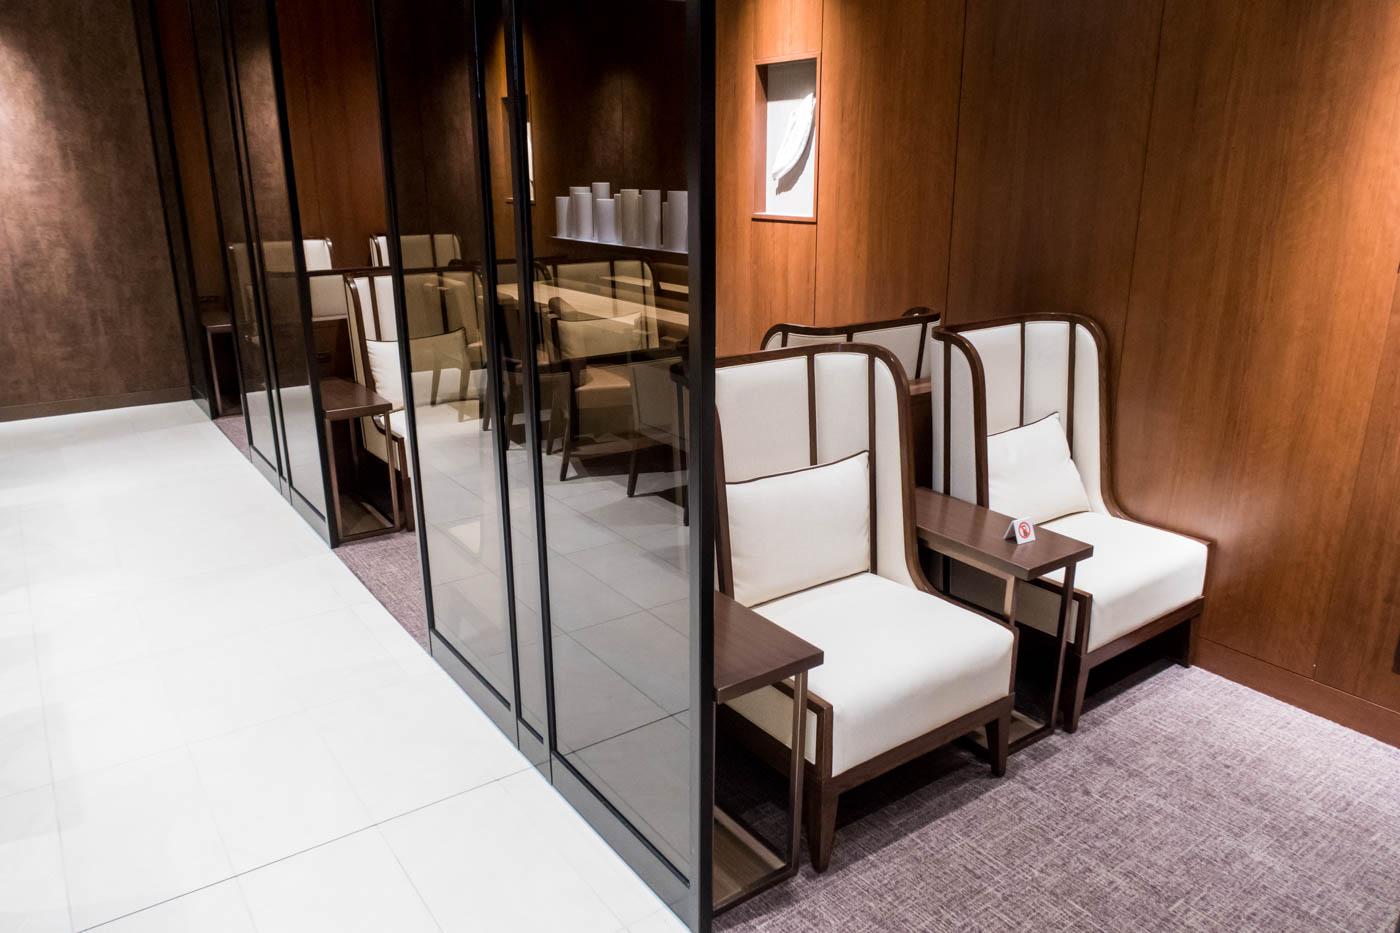 JAL Sakura Lounge Sofa Chairs